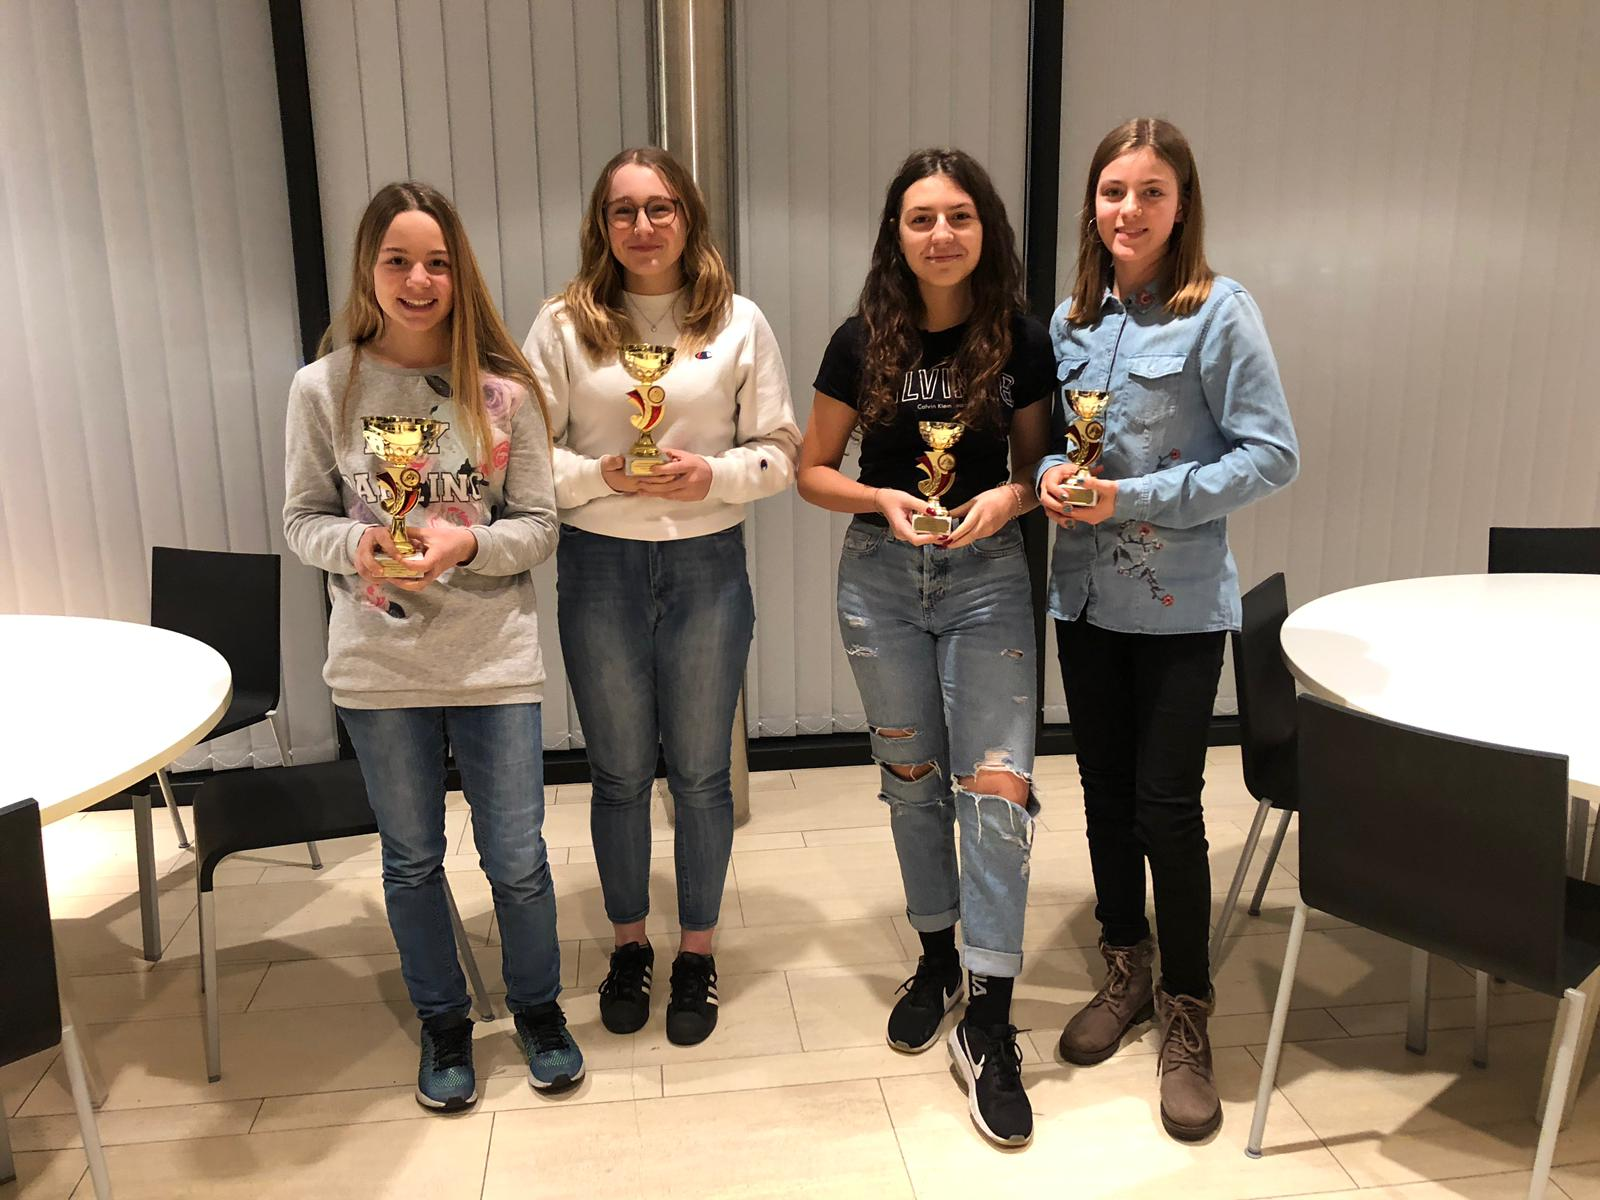 Dressur Junioren: 1. Kyra, 2. Annina, 3. Tamara, 4. Janina